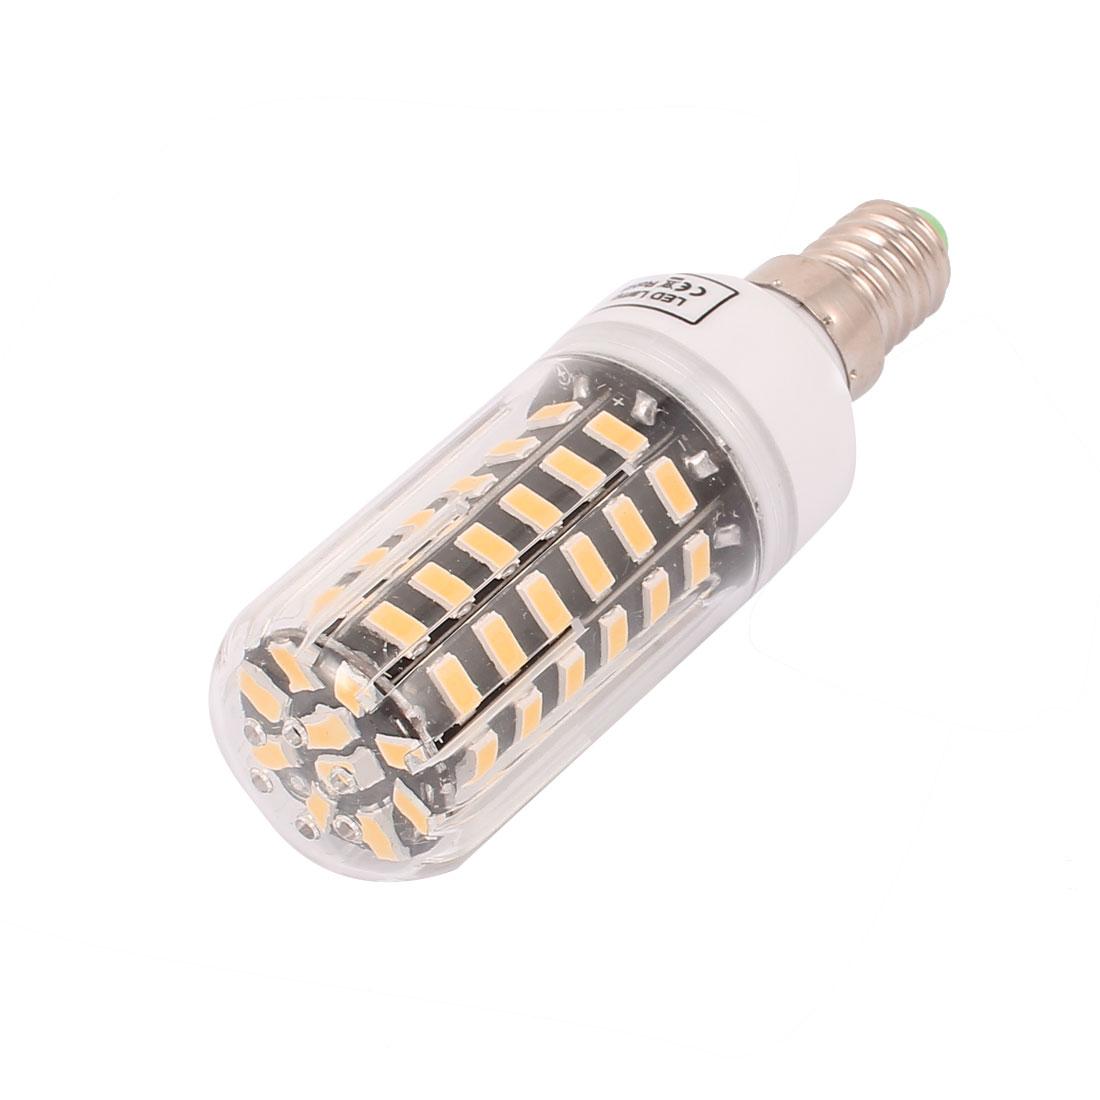 AC 220V New Super Bright E14 7W 64 LEDs 5733 SMD Energy Saving Corn Bulb Lamp Warm White